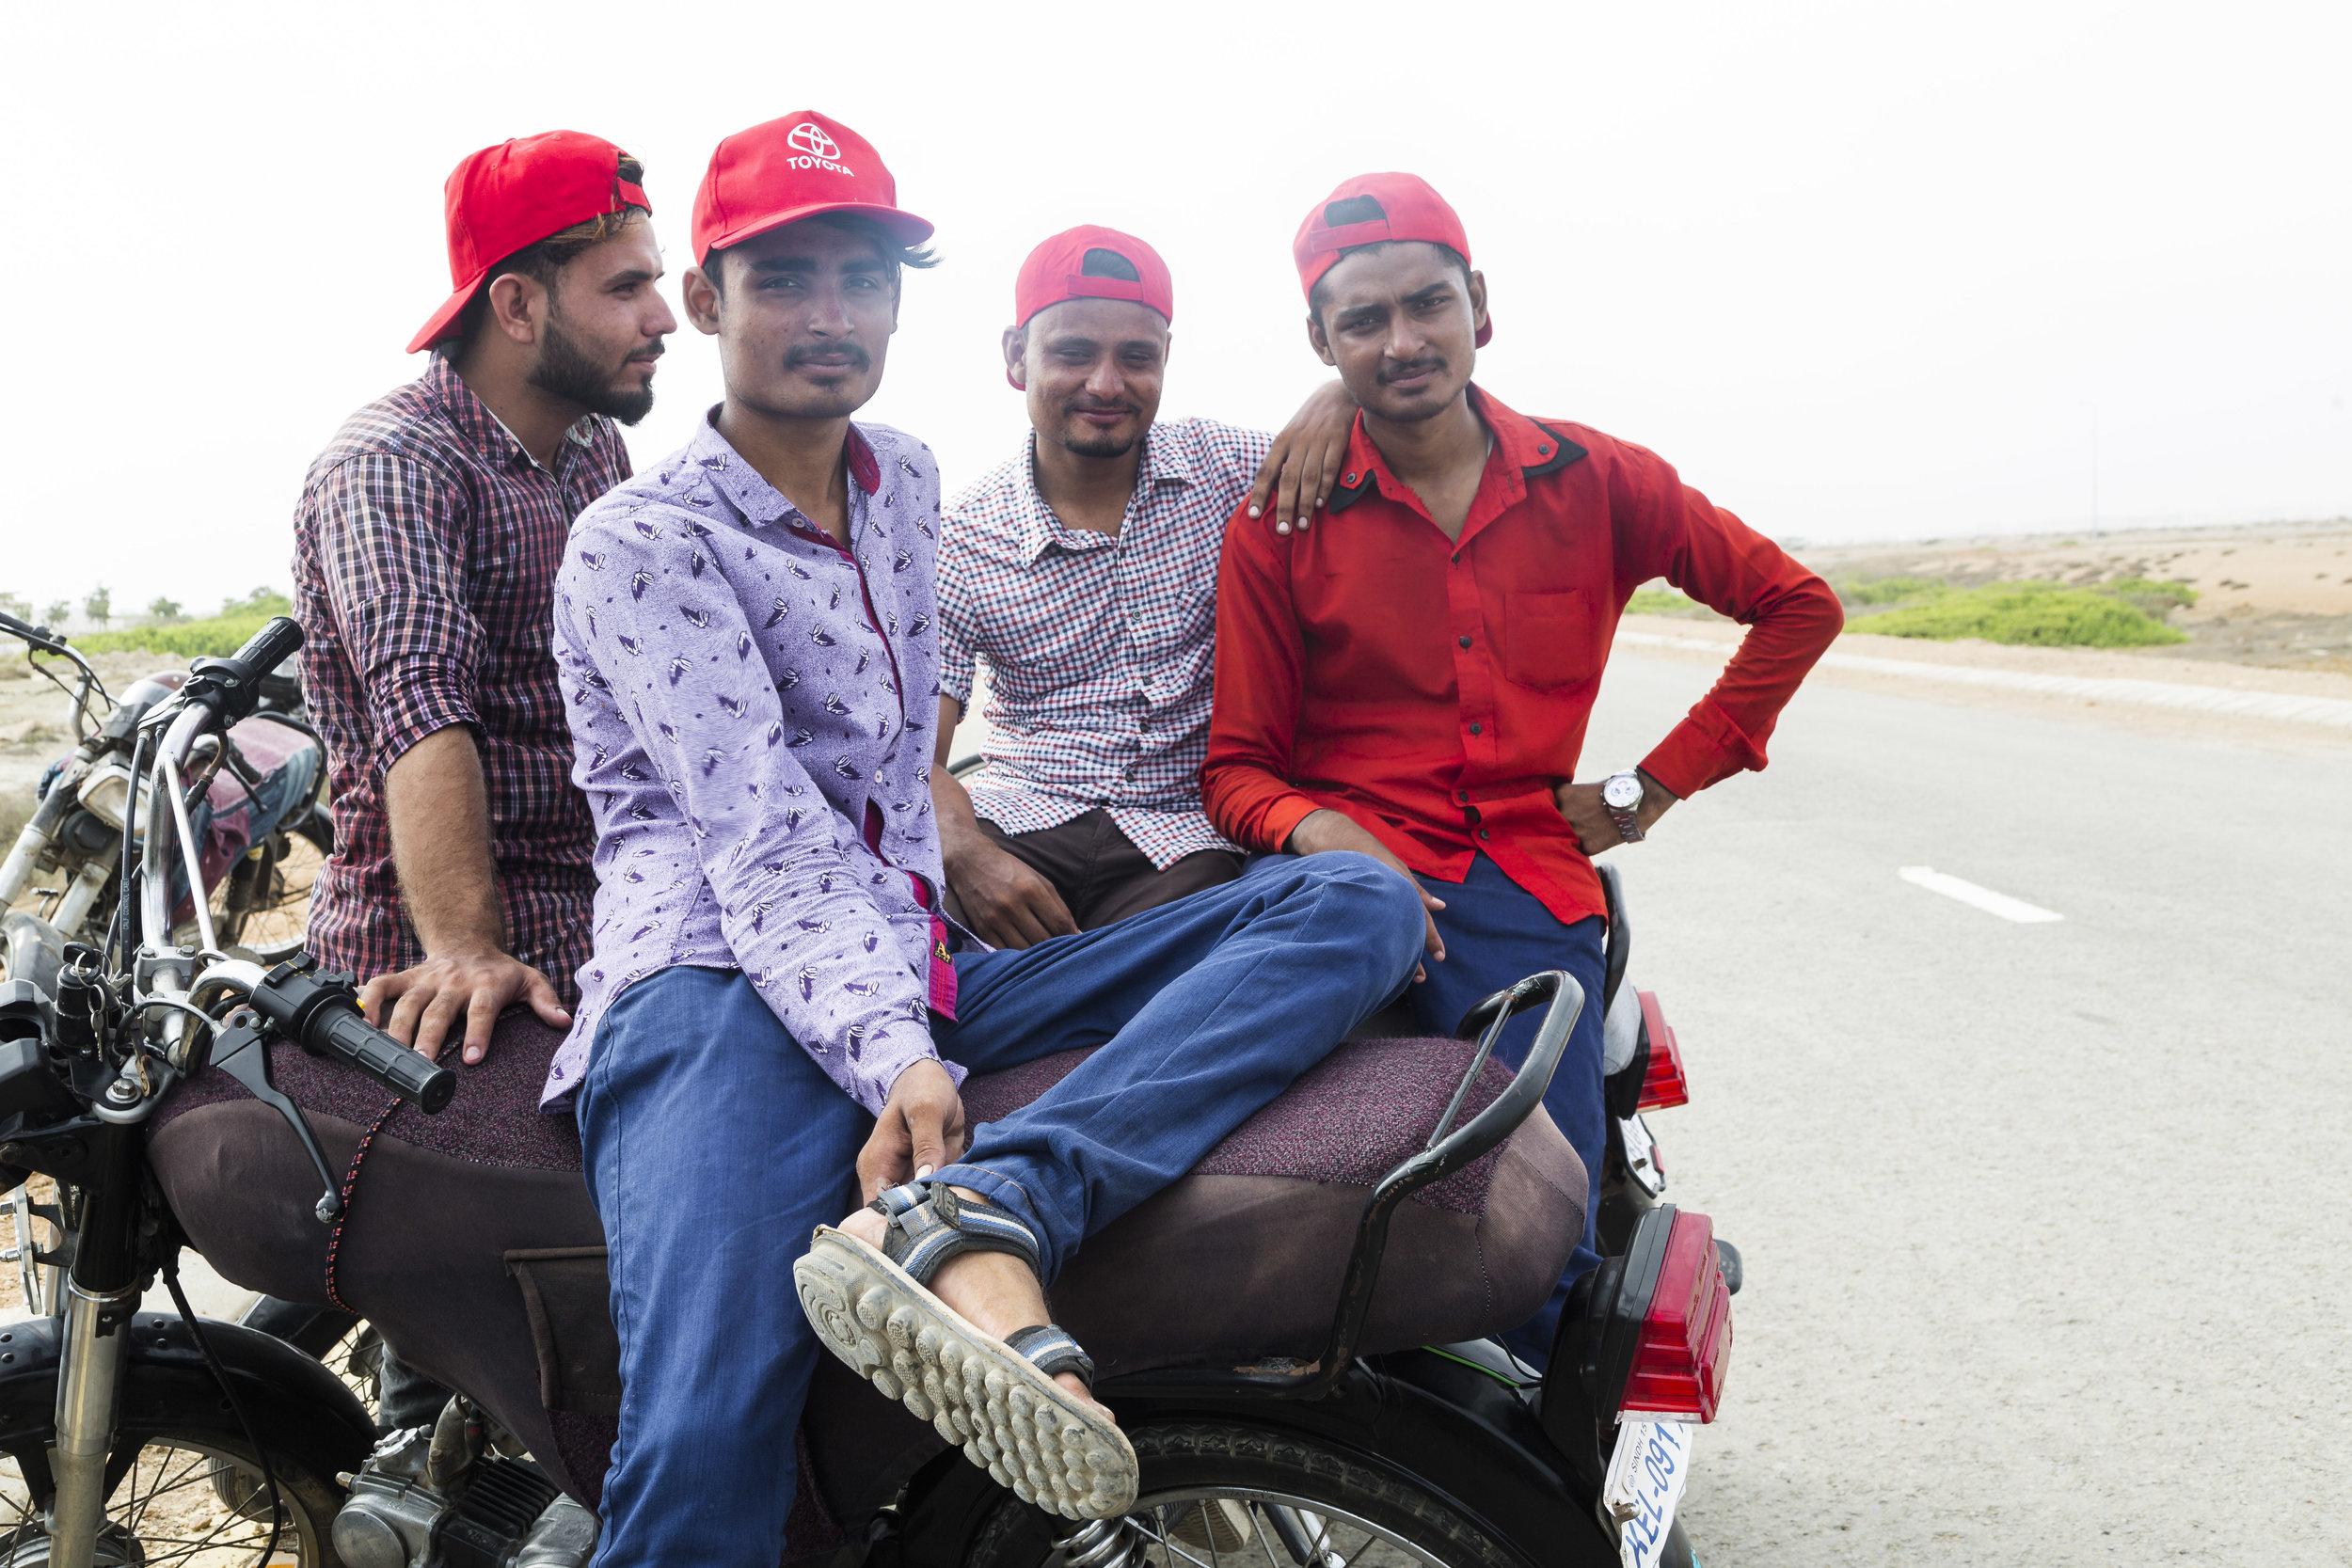 Trainers Abdullah Bangash, Muhammad Hamza, Zeeshan Bangash, and Muhammad Muzammil. June 30, 2019